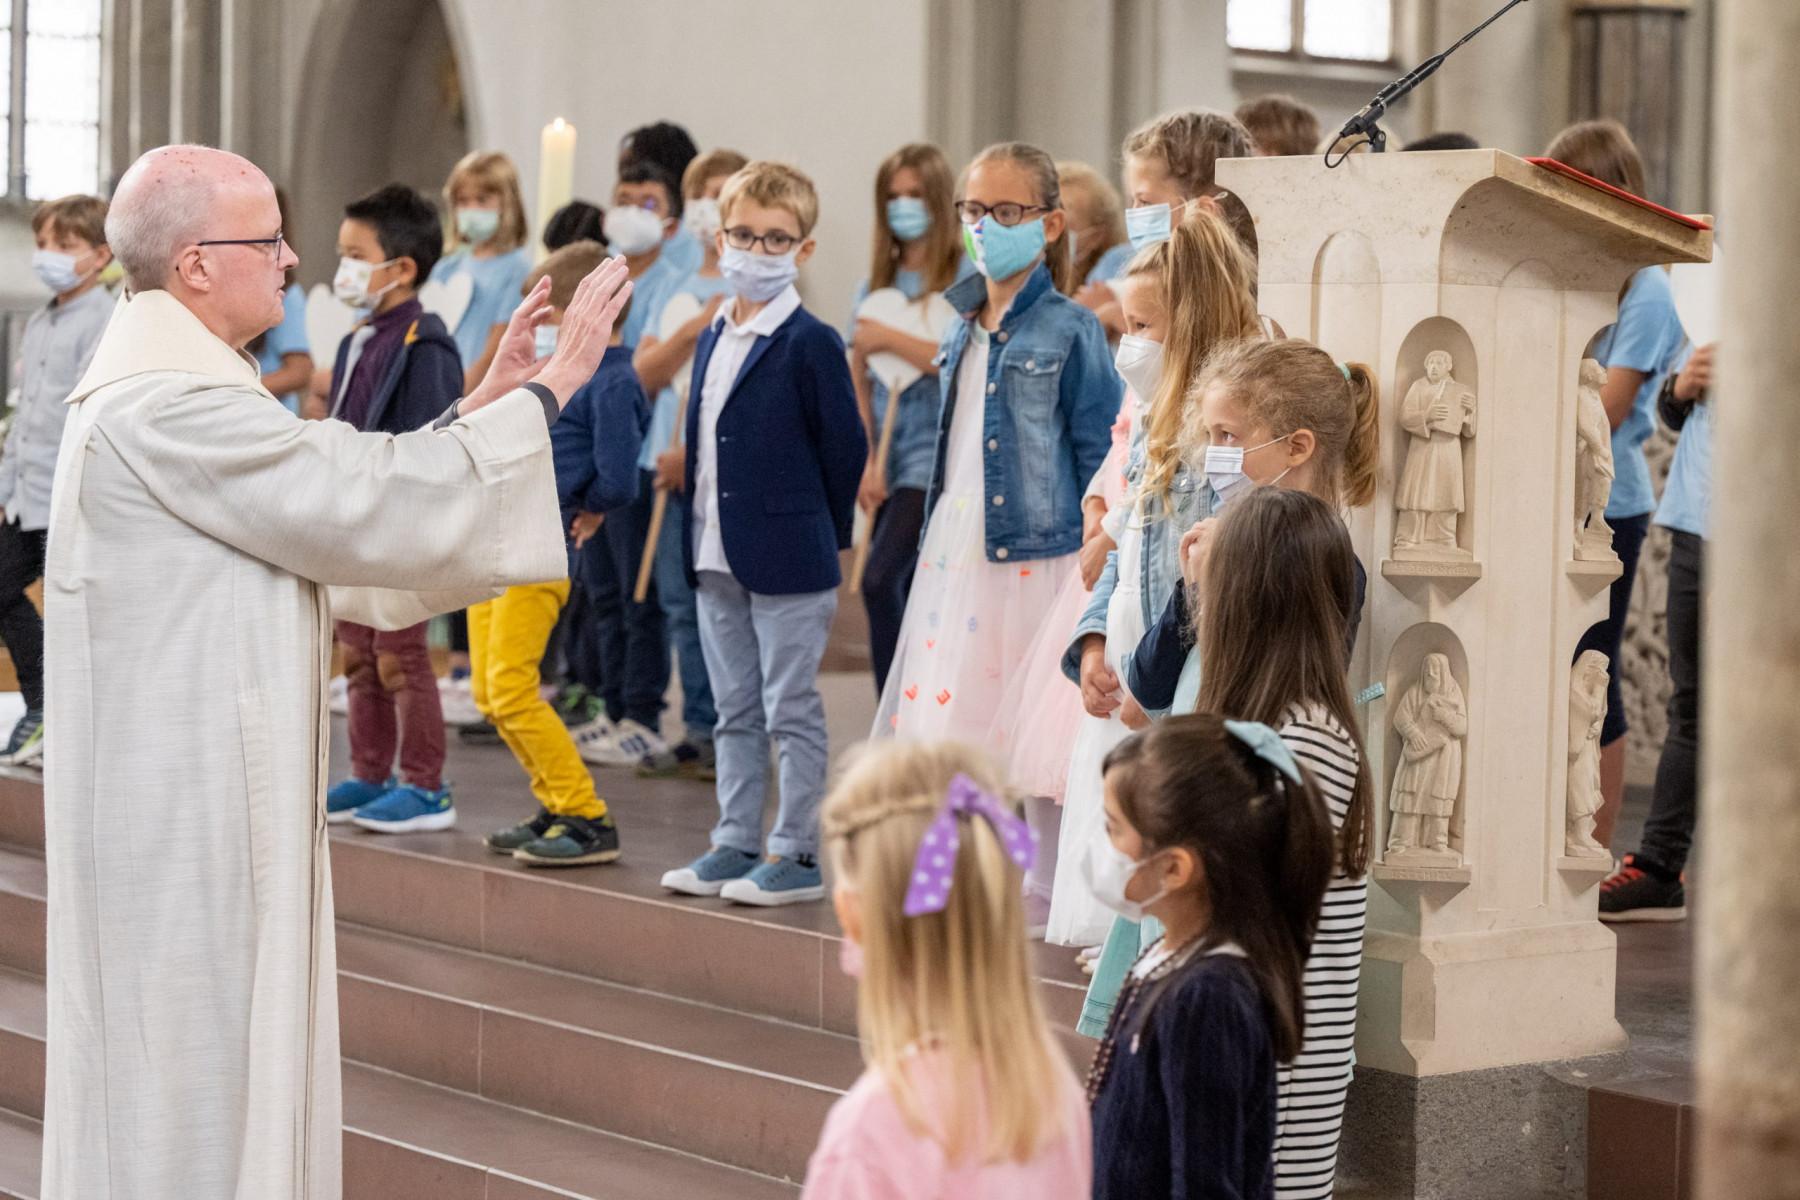 Grundschule Edith Stein -   Einschulung 2021, Aegiedien Kirche Braunschweig am 04.September 2021.